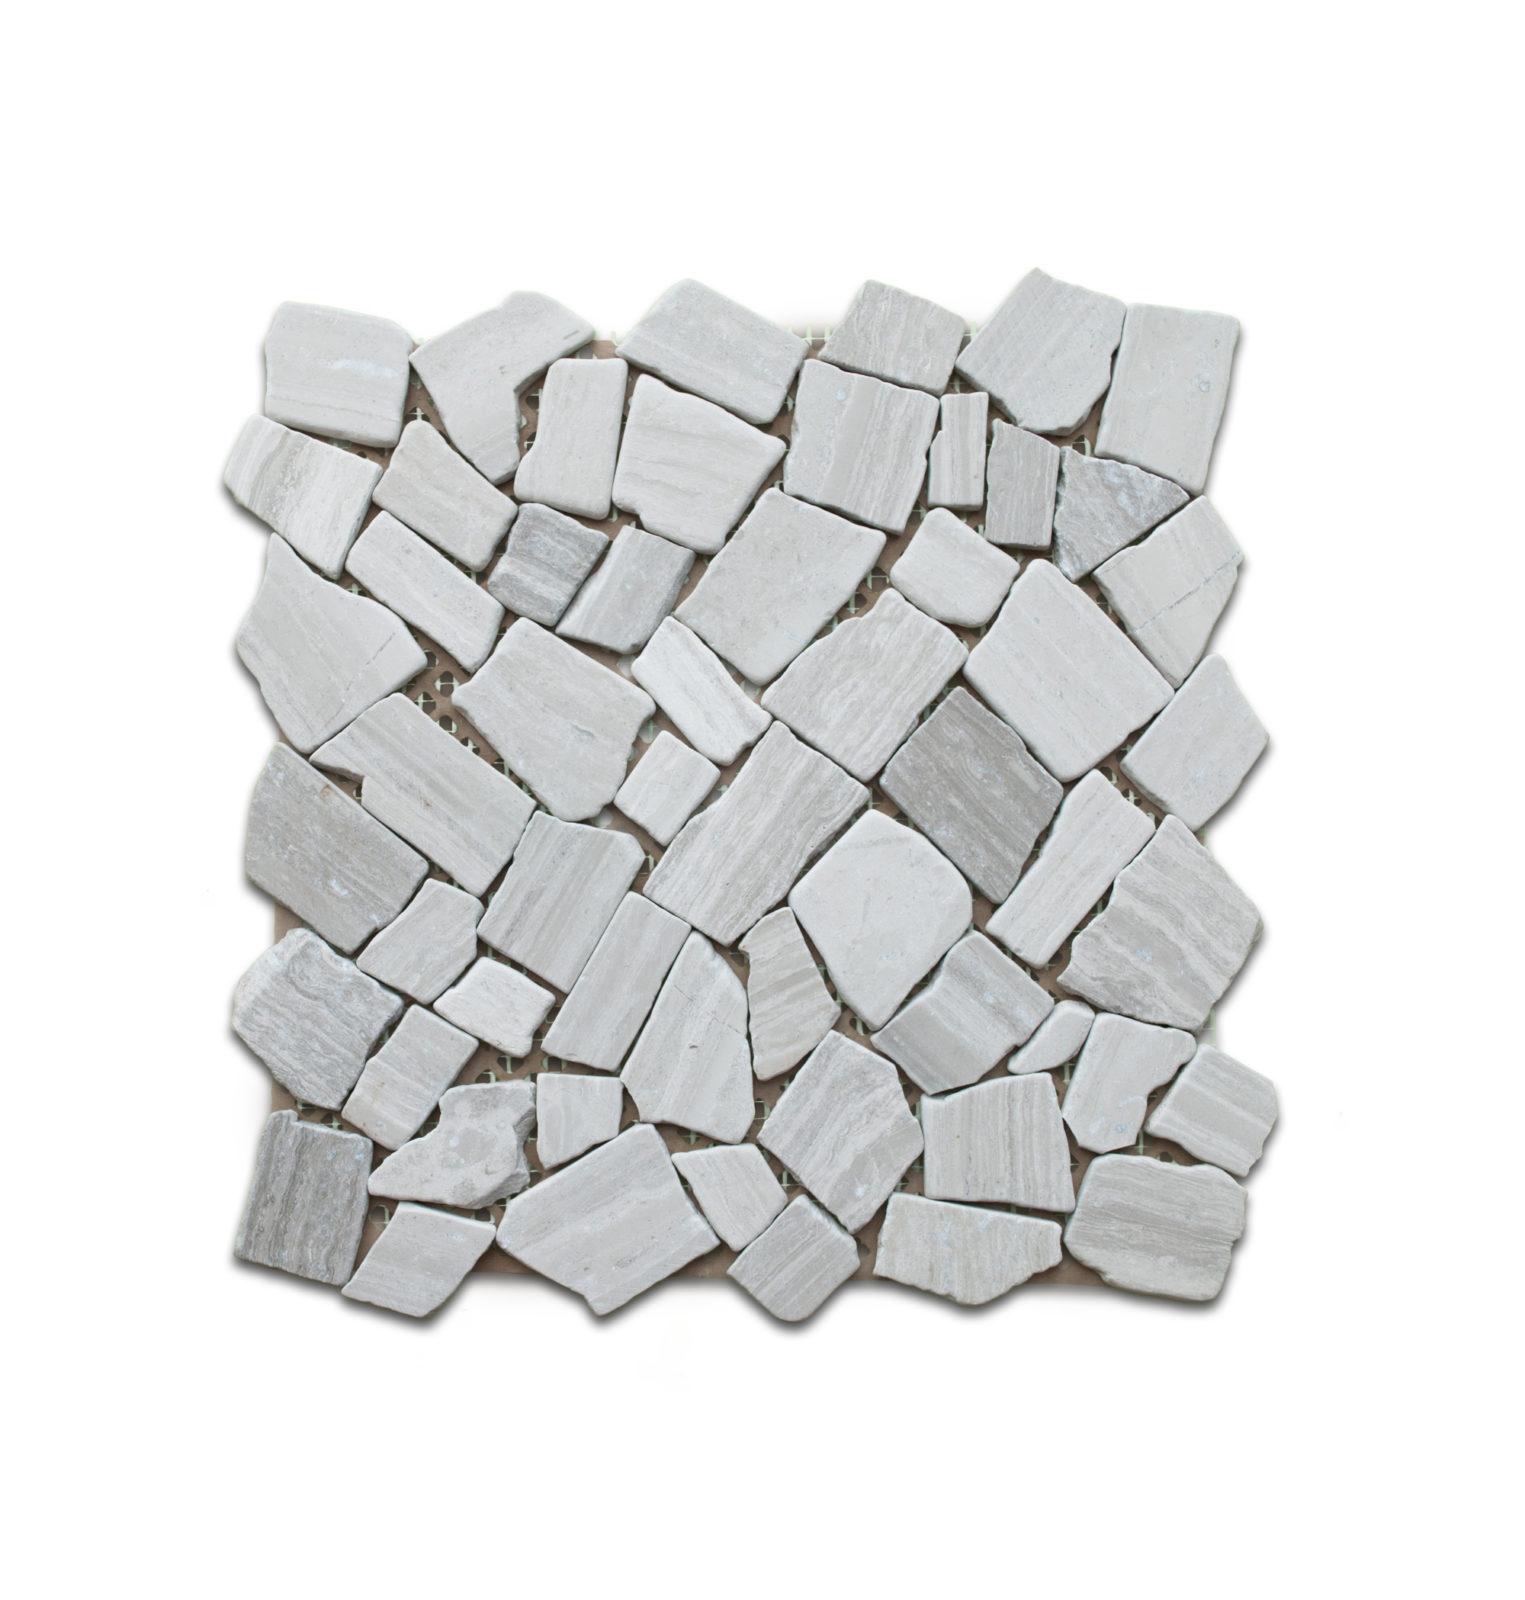 Flat wood gray pebble stone